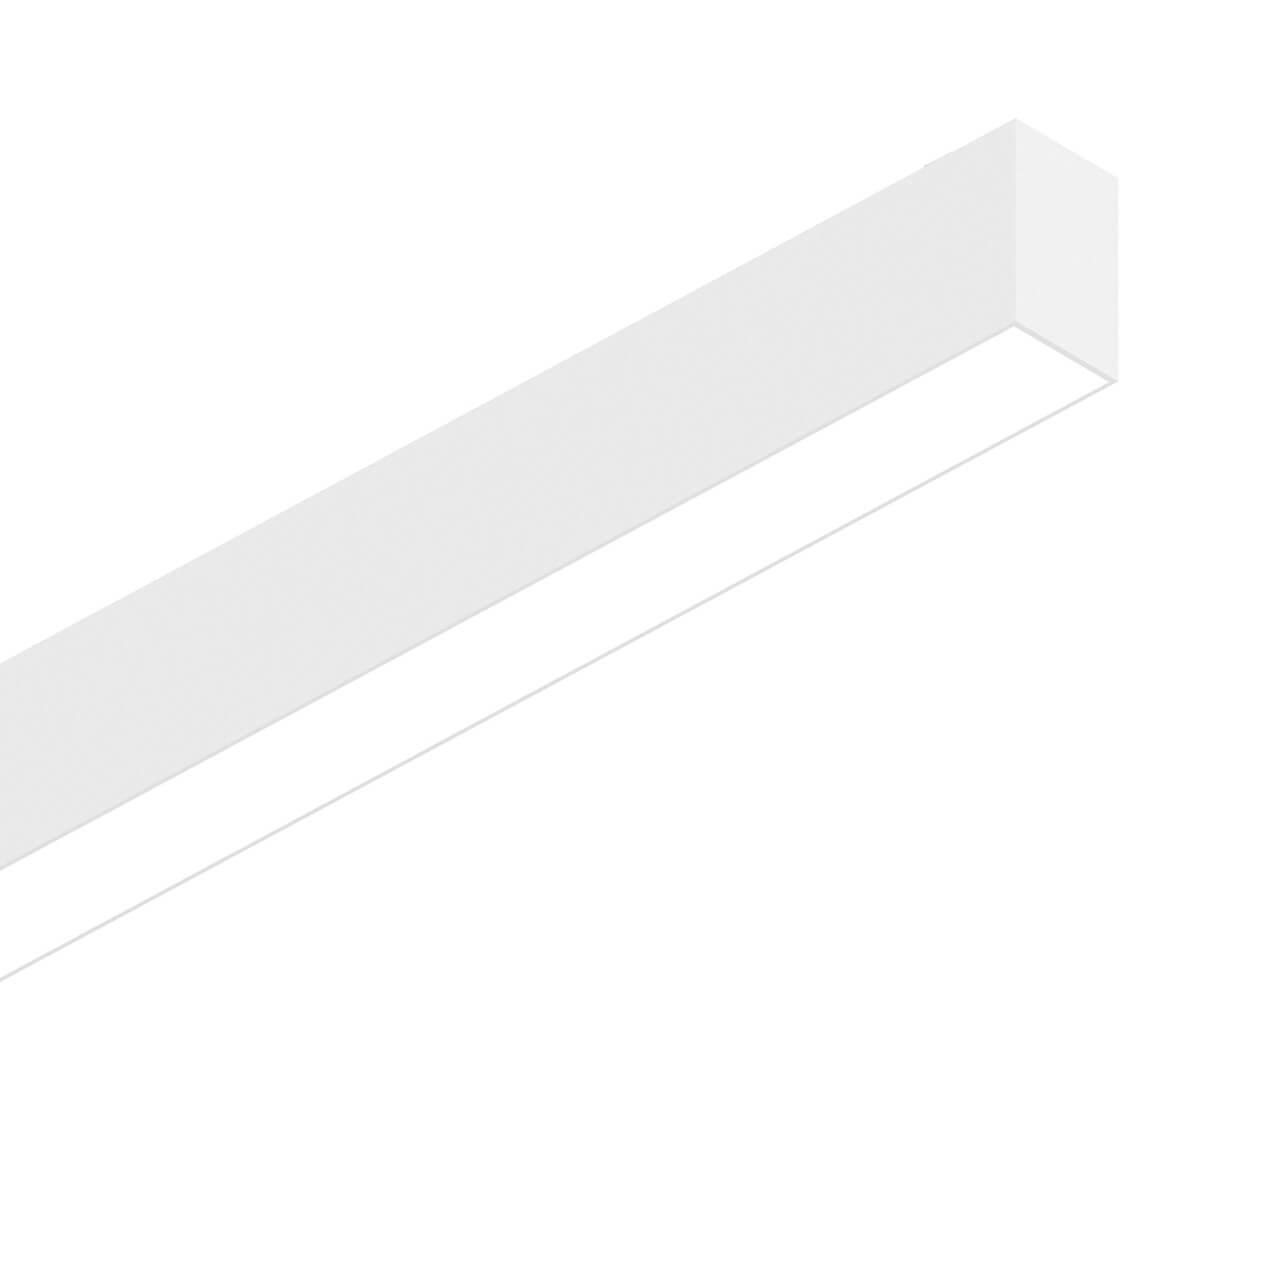 Подвесной светодиодный светильник Ideal Lux Fluo Wide 1200 3000K White diy 3w 3000k 315lm warm white light round cob led module 9 11v